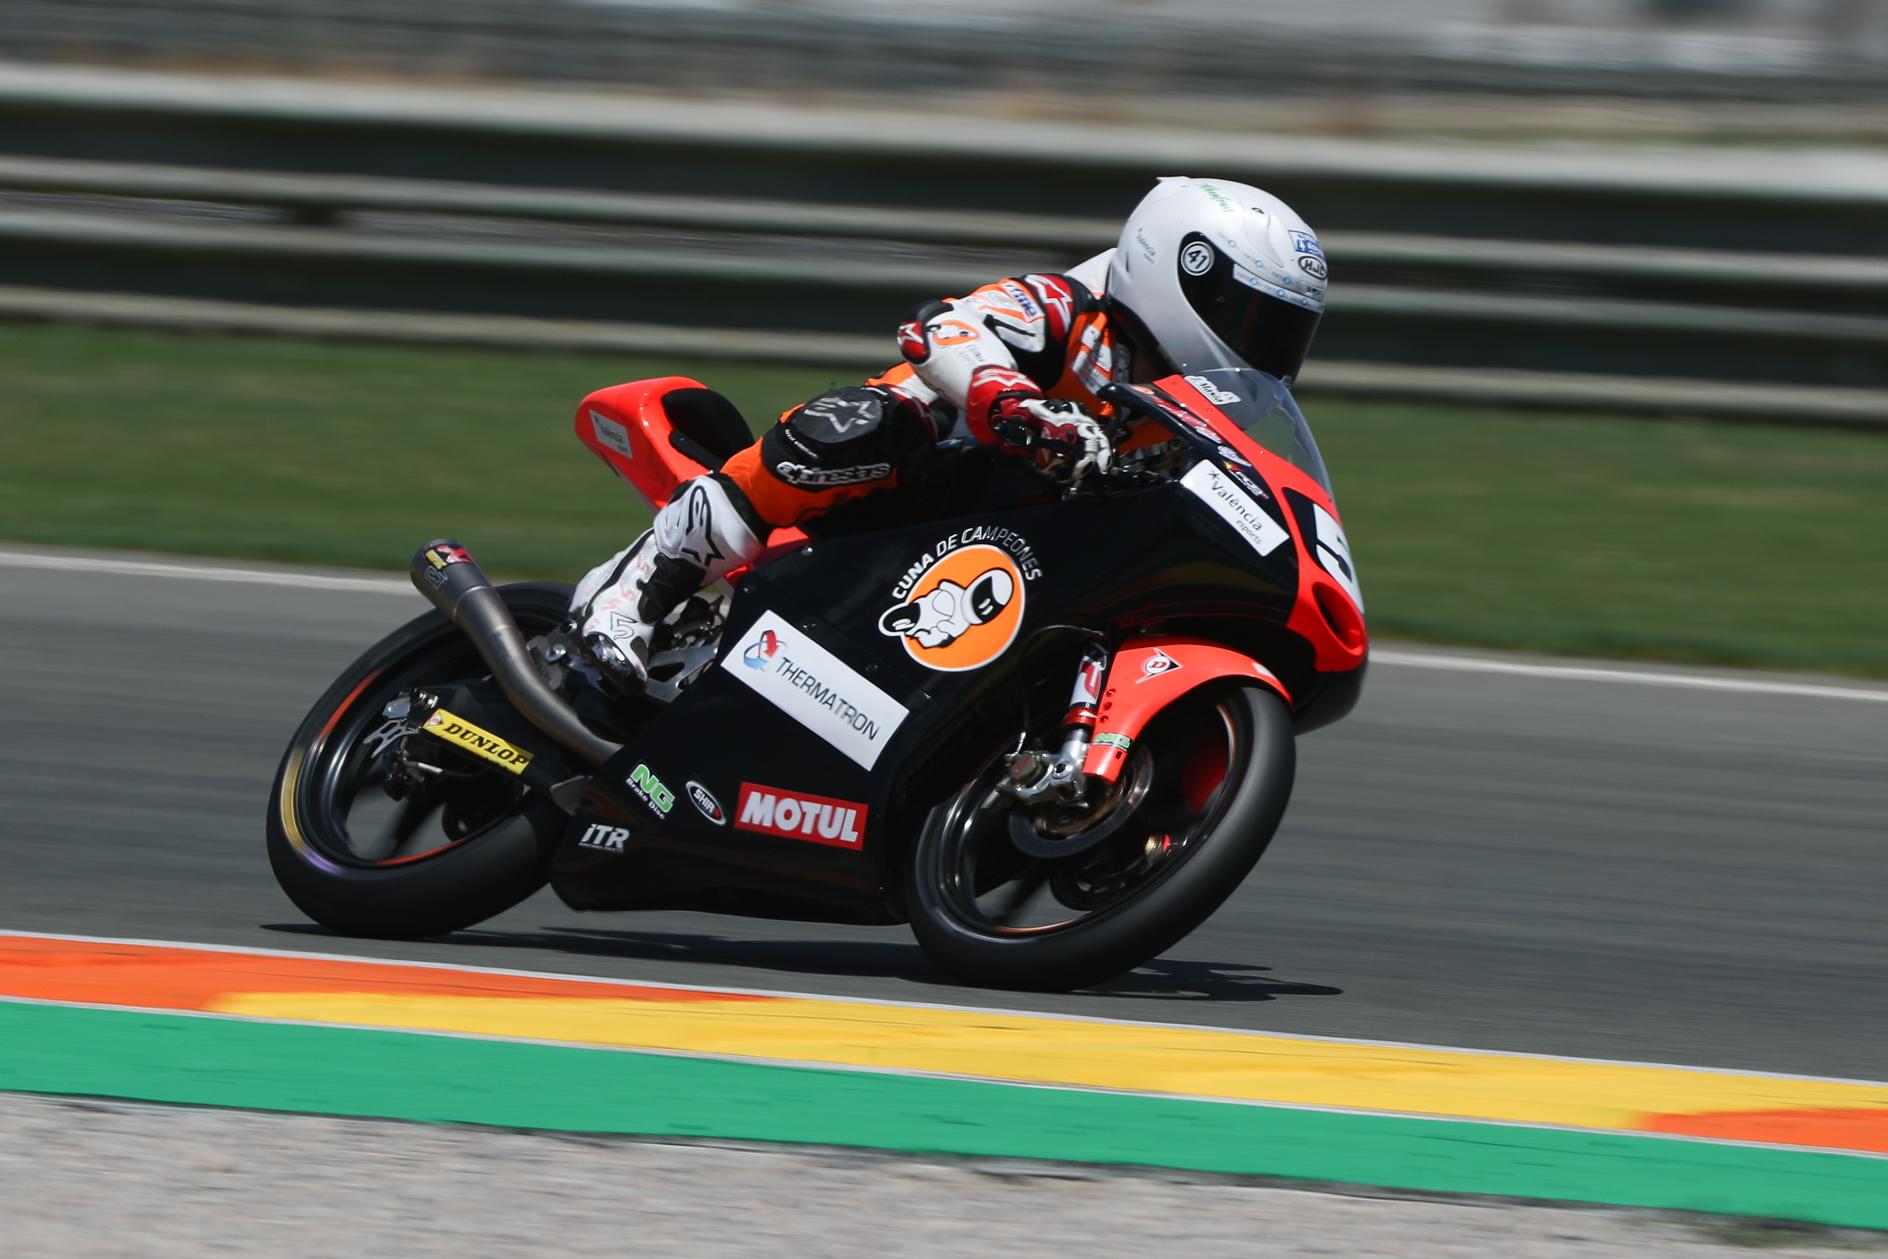 Jaume Masià damunt la seua moto al Circuit Ricardo Tormo de Xest.